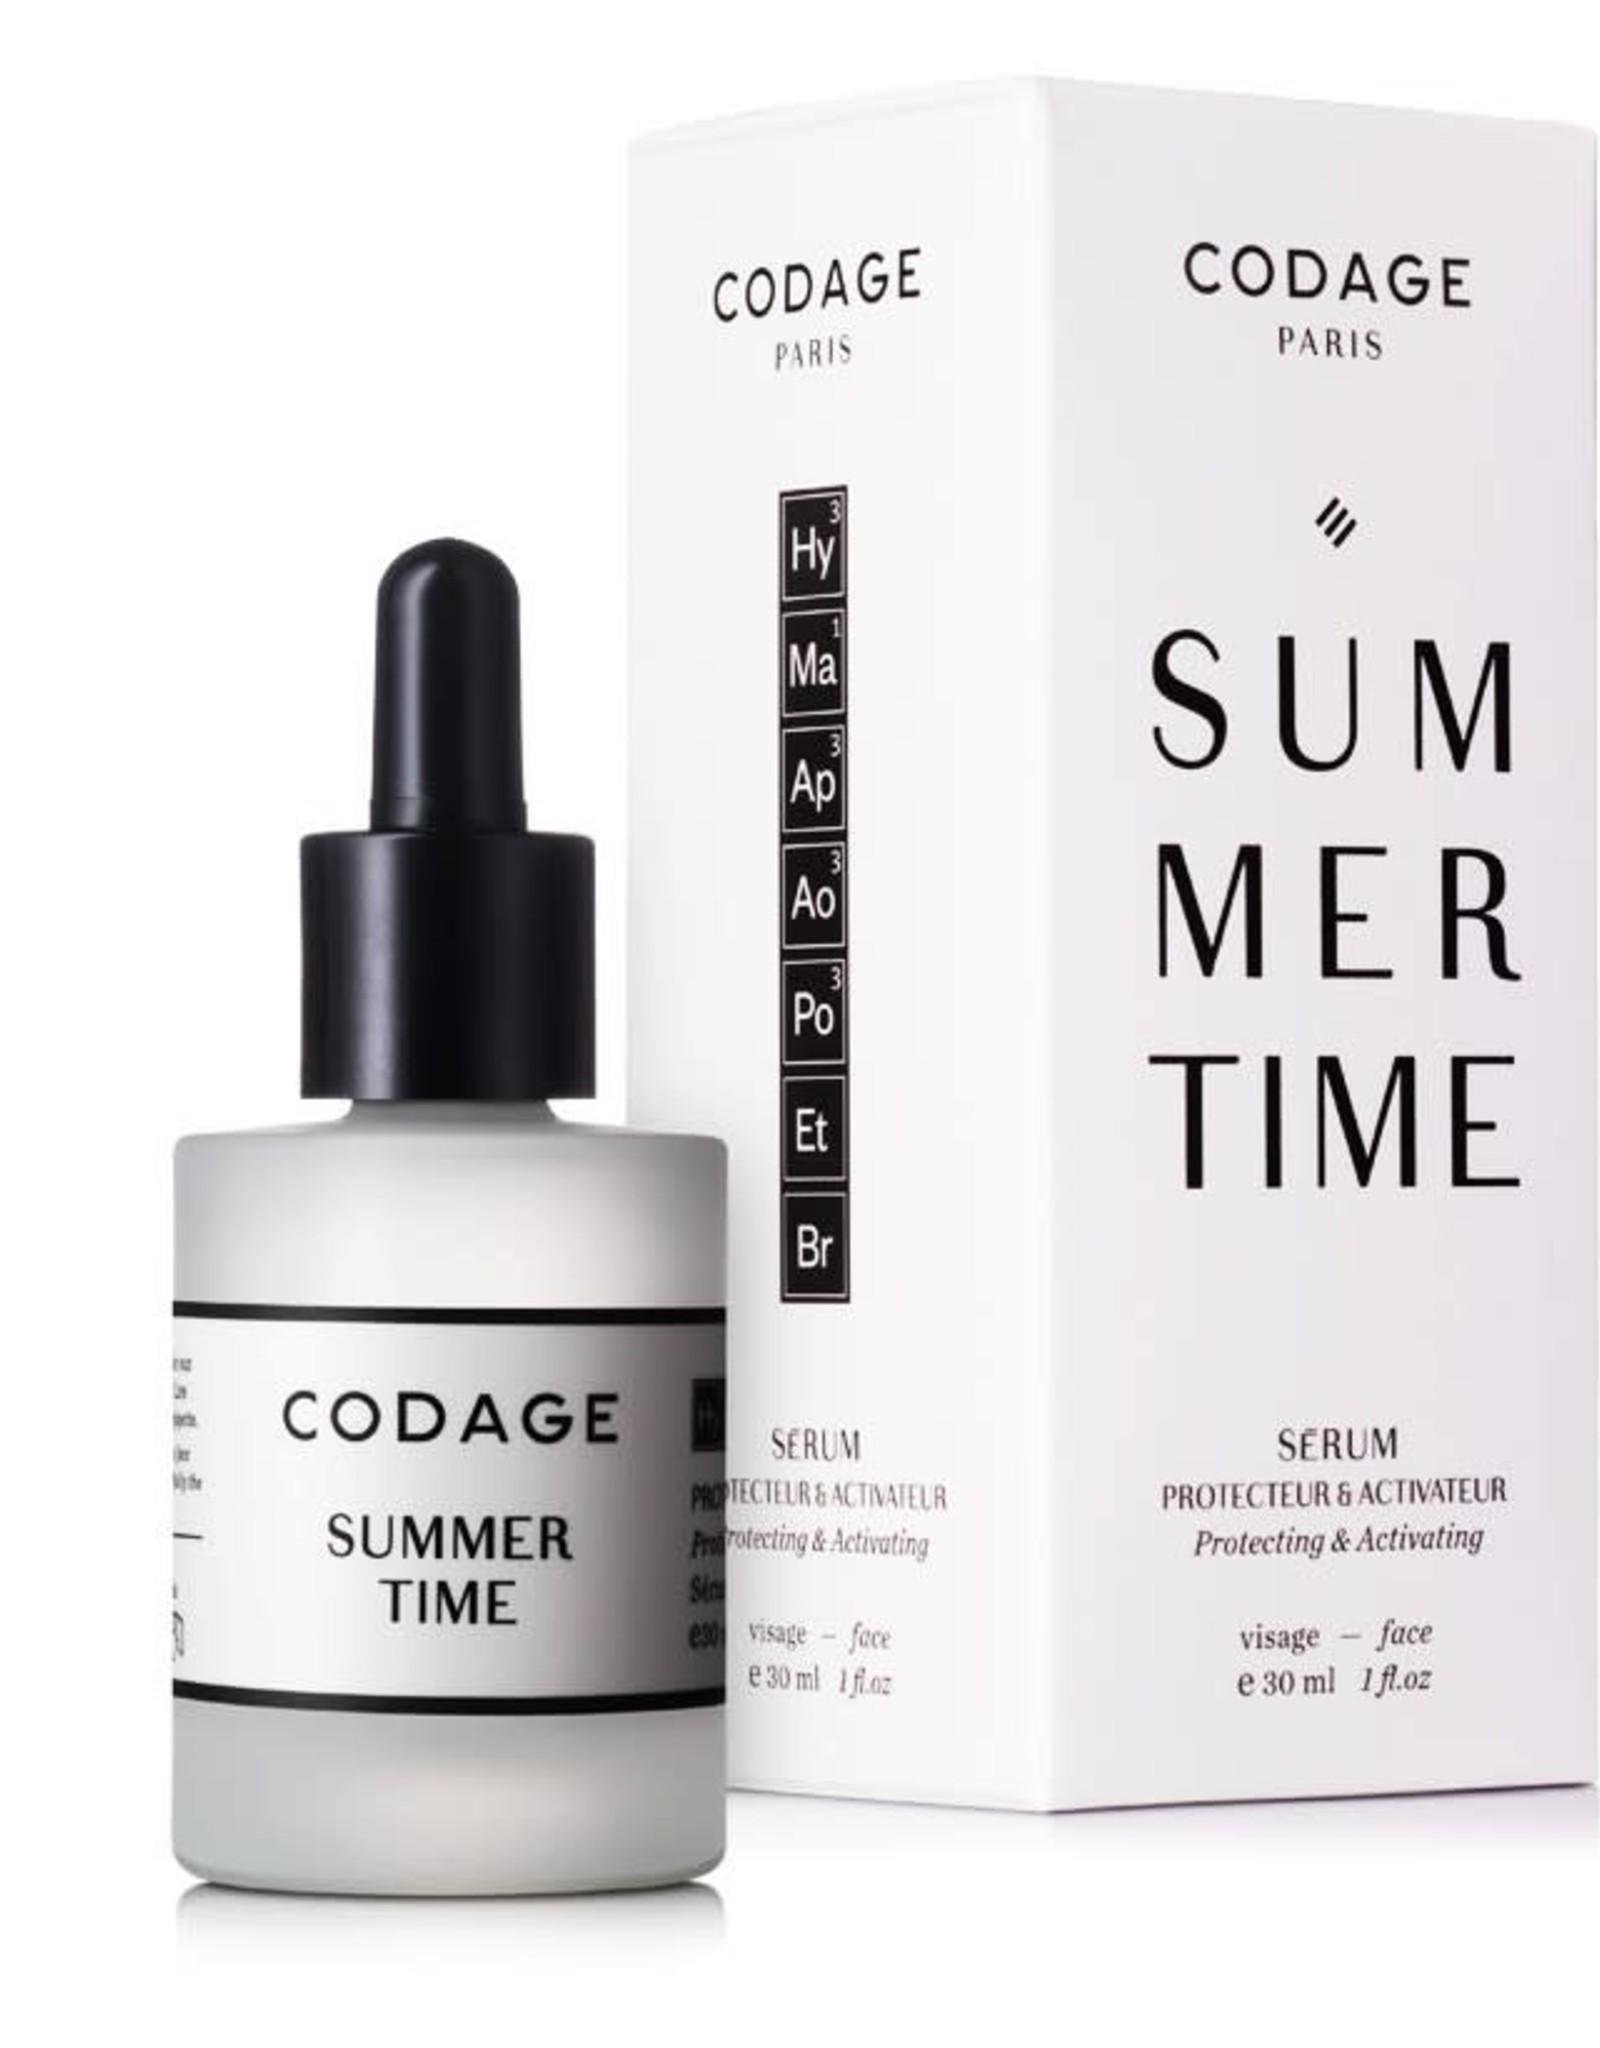 "Codage Paris CODAGE PARIS ""SUMMER TIME"" - Protecting & Activating 30ML"